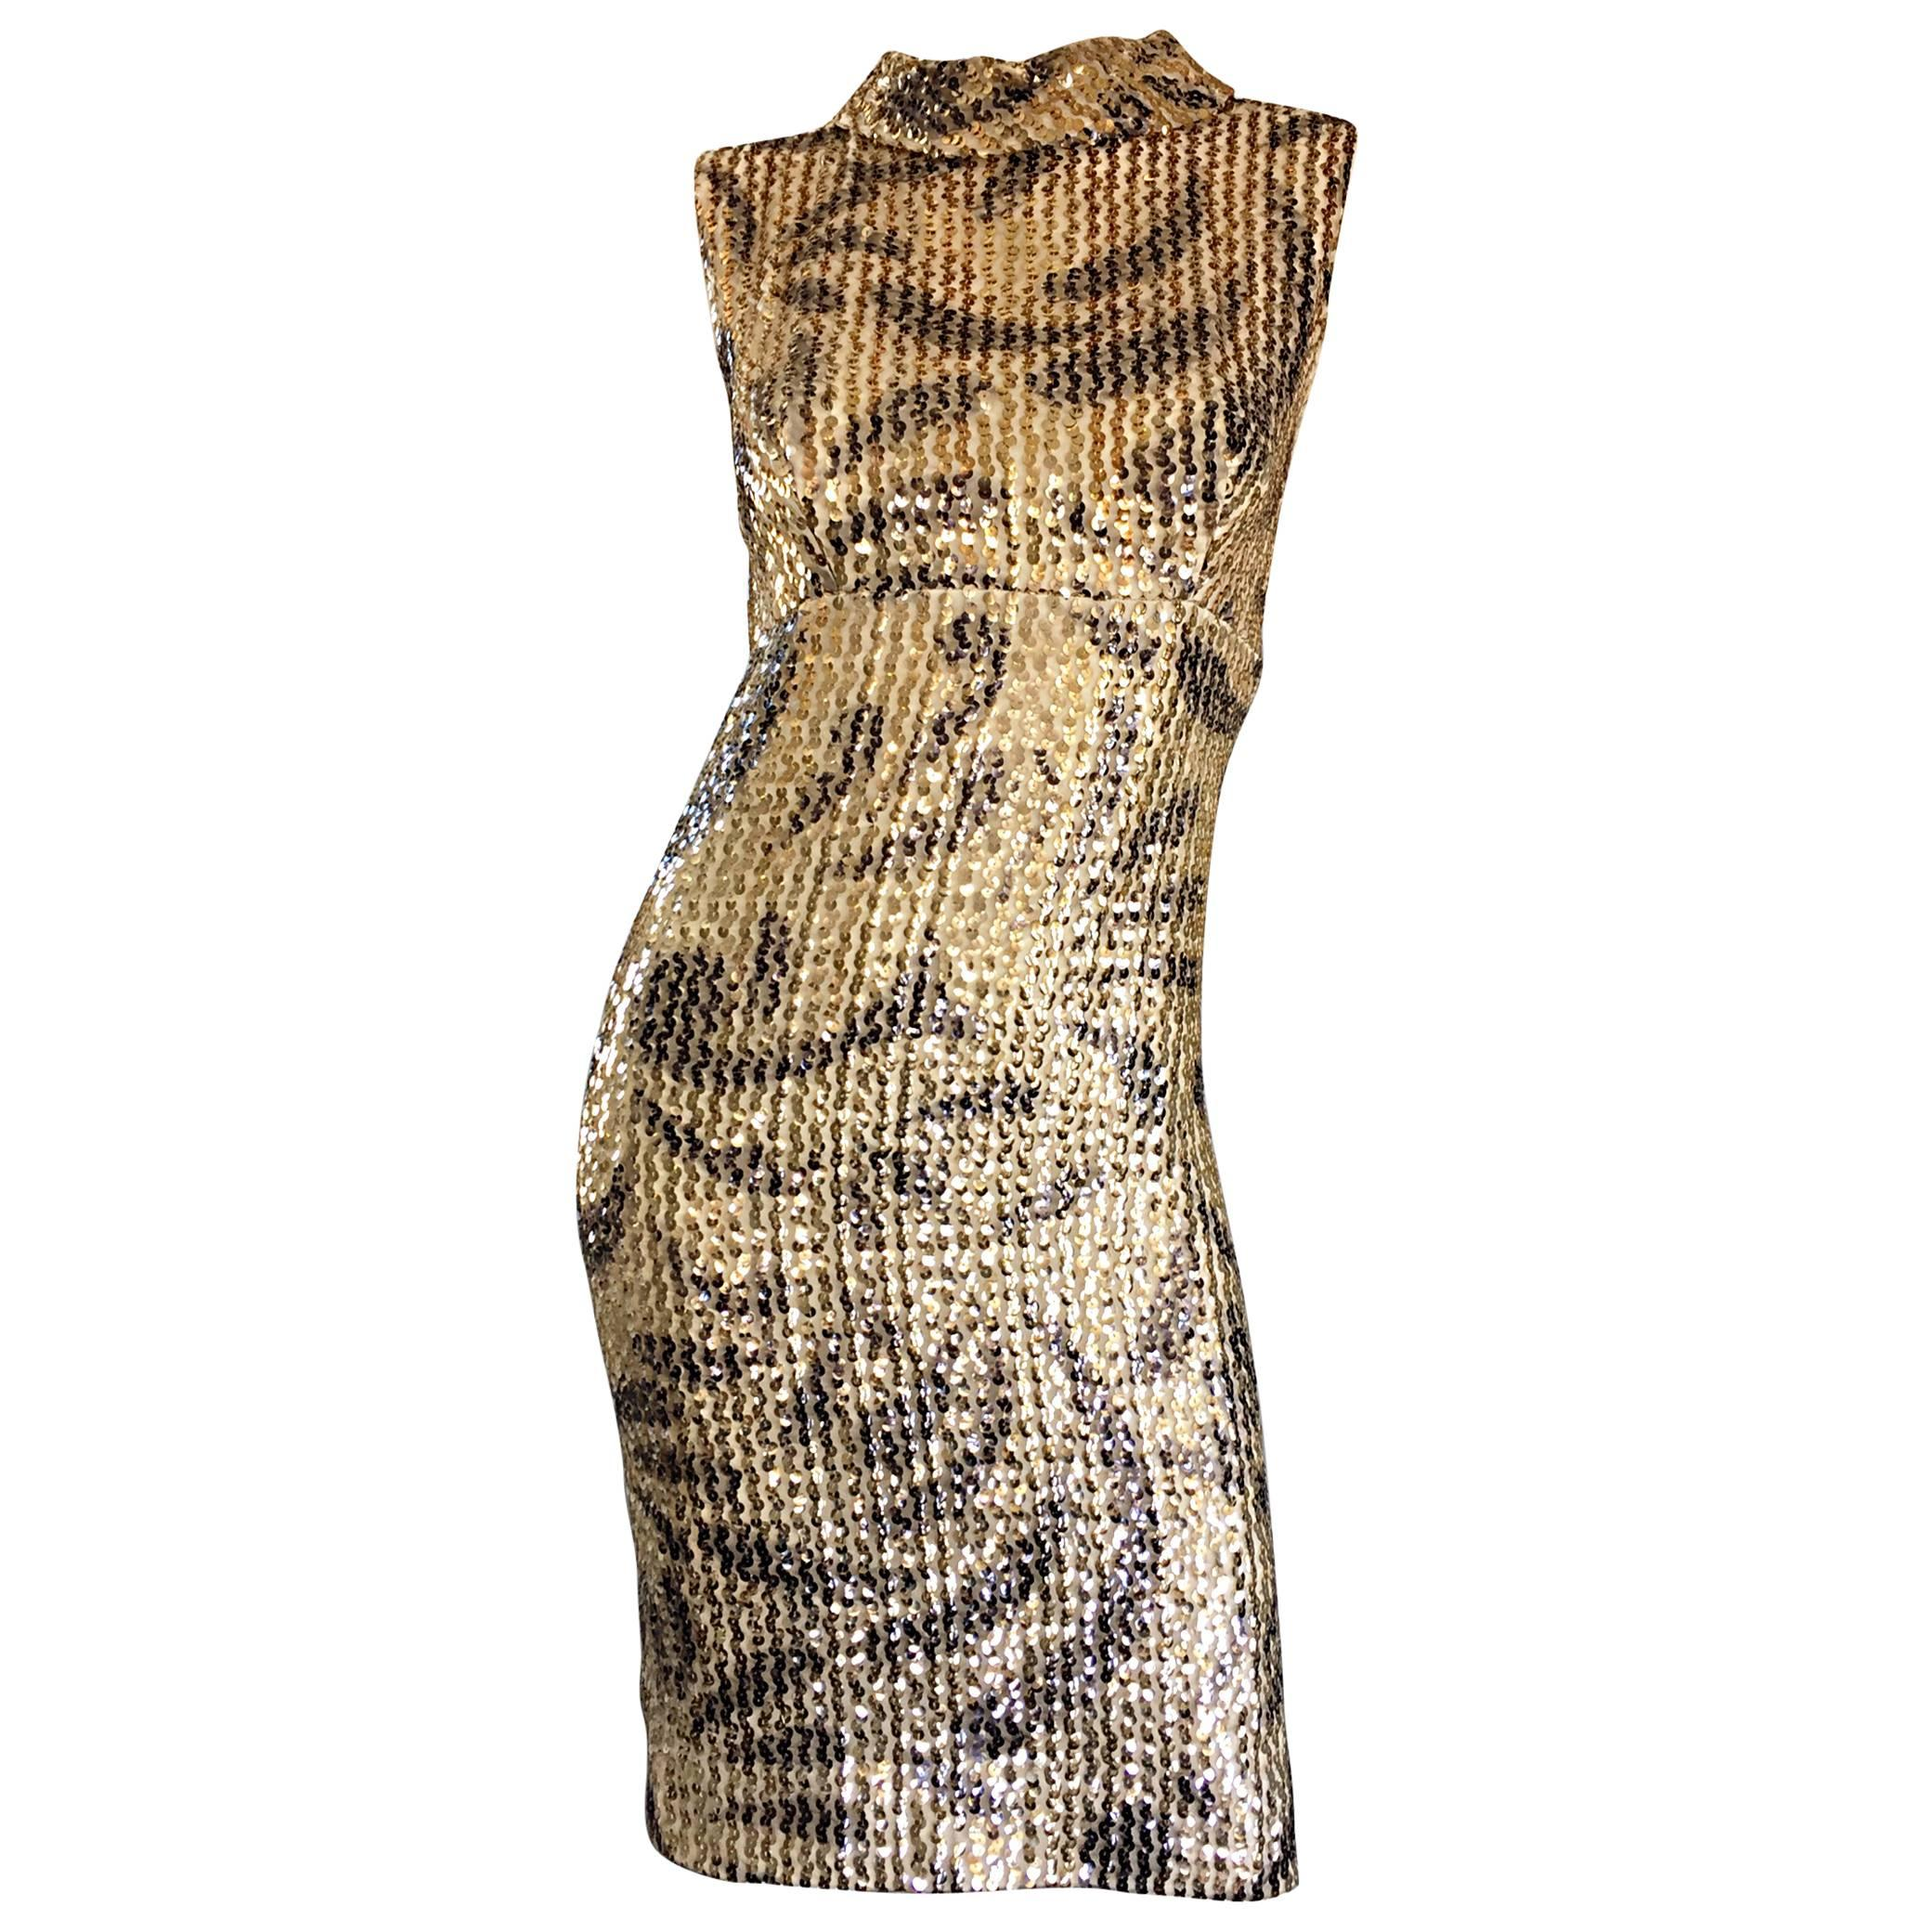 Elinor Gay 1960s Vintage Gold + Black Sequin 60s Retro Mod Wiggle Shift  Dress For Sale at 1stdibs a6e126140